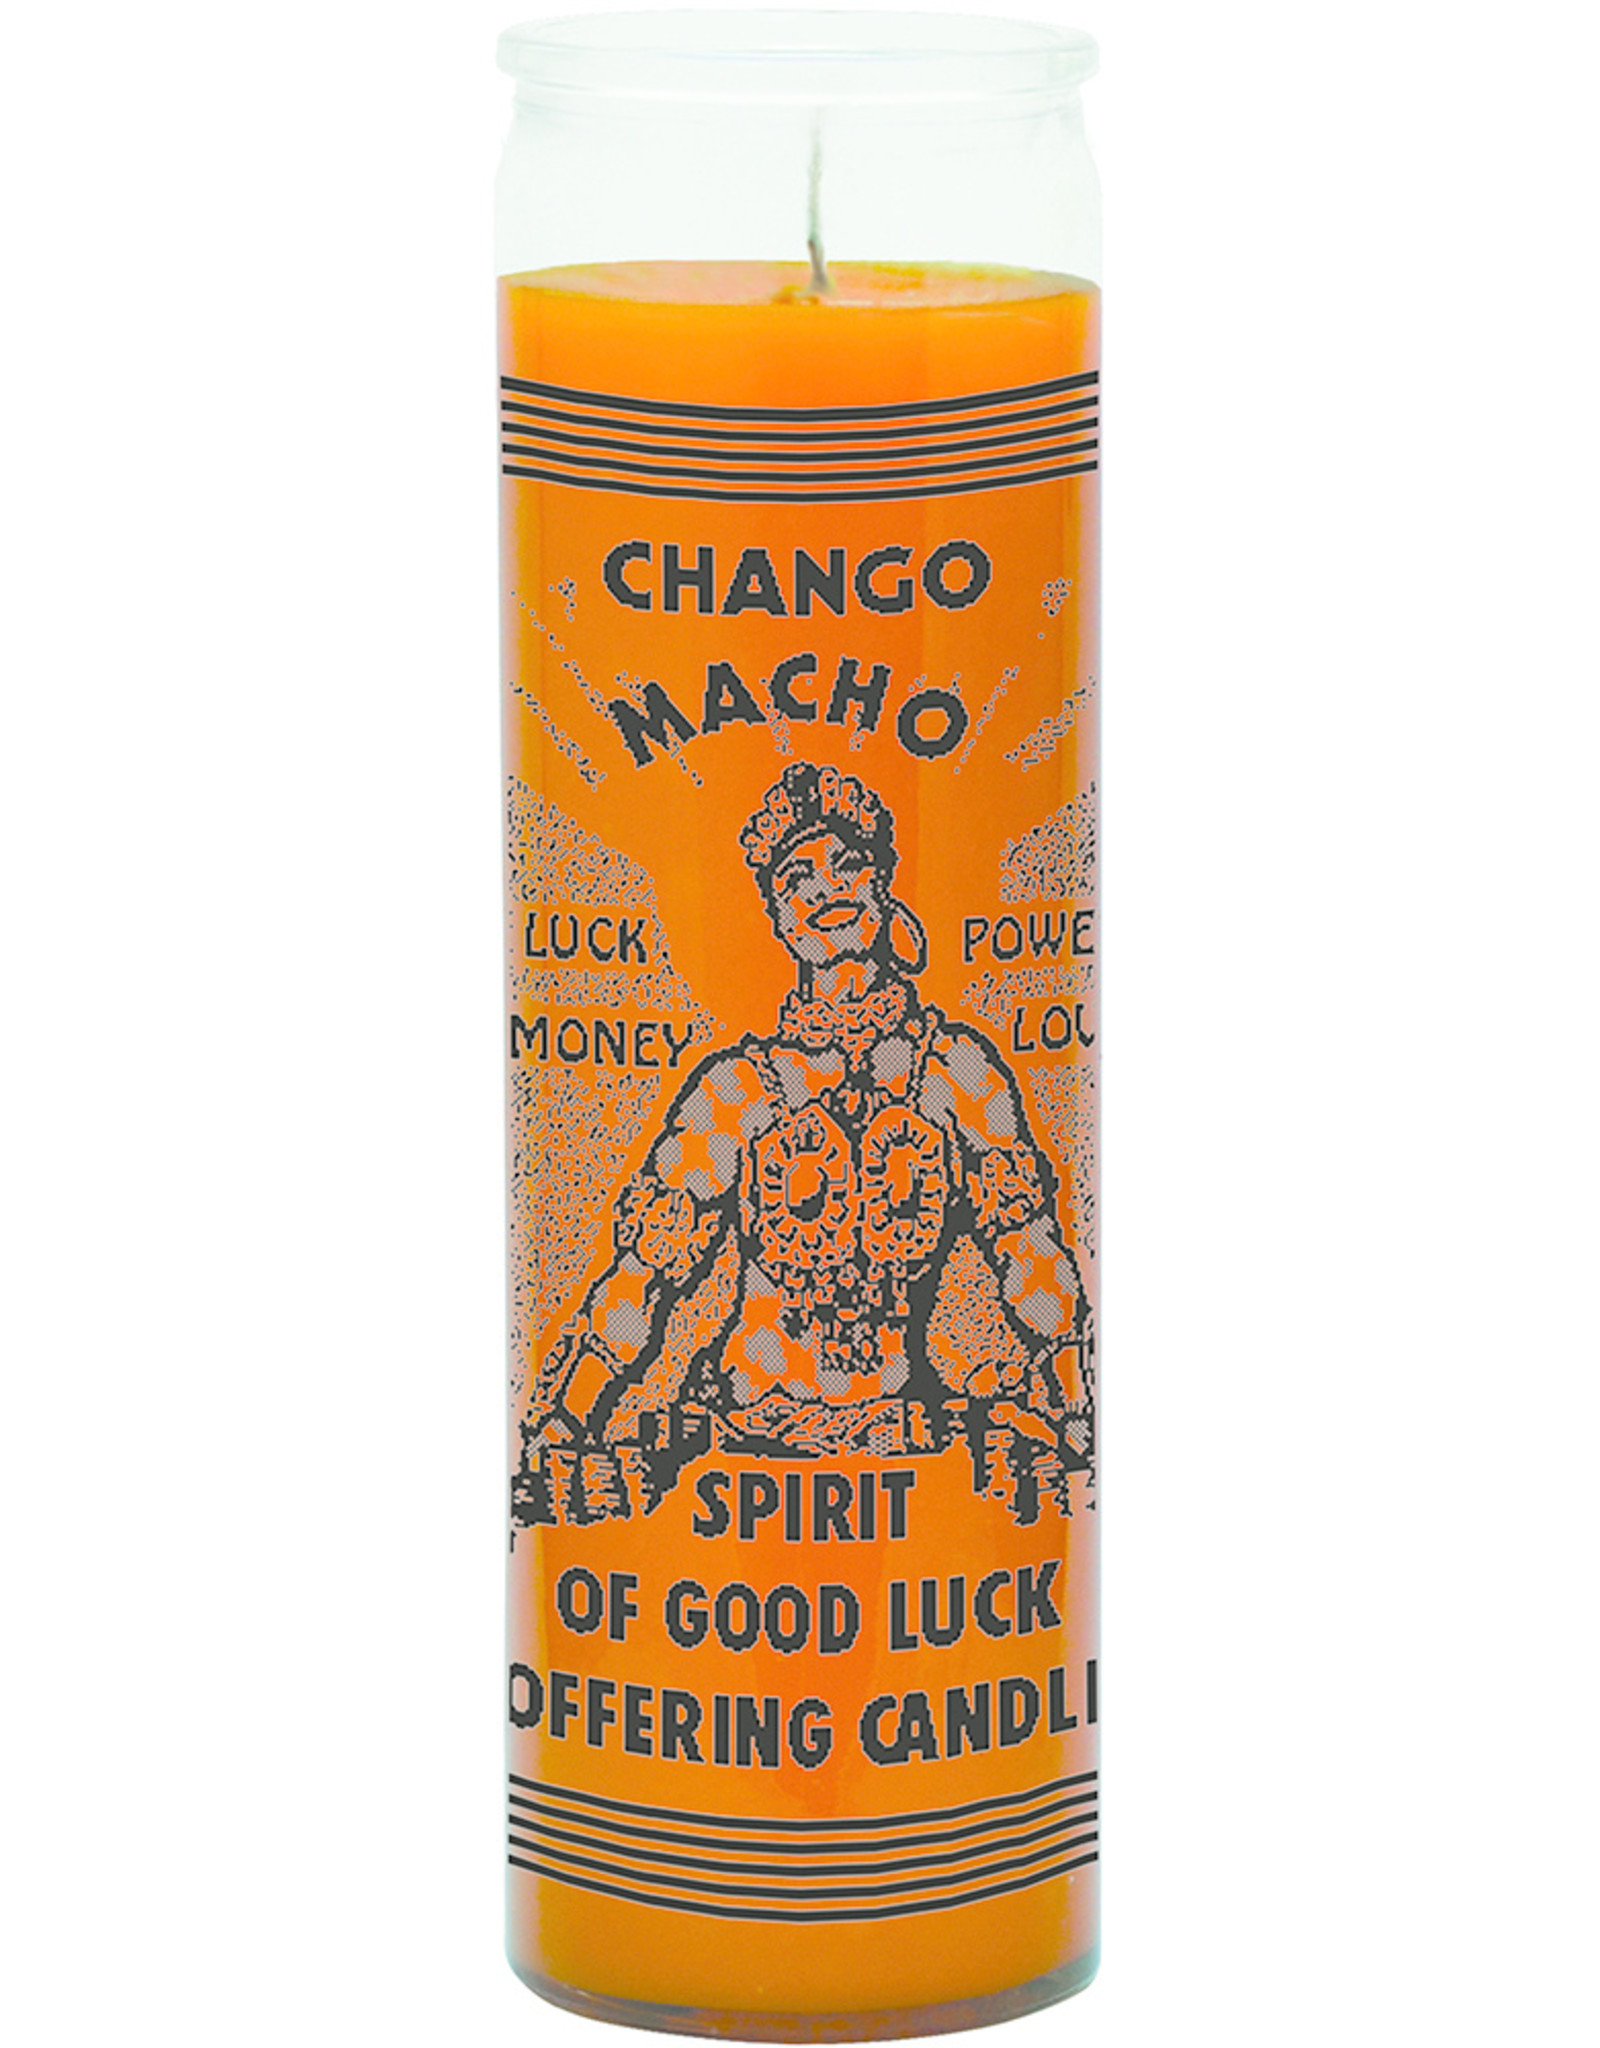 Good Luck  Chango 7 Days Candle